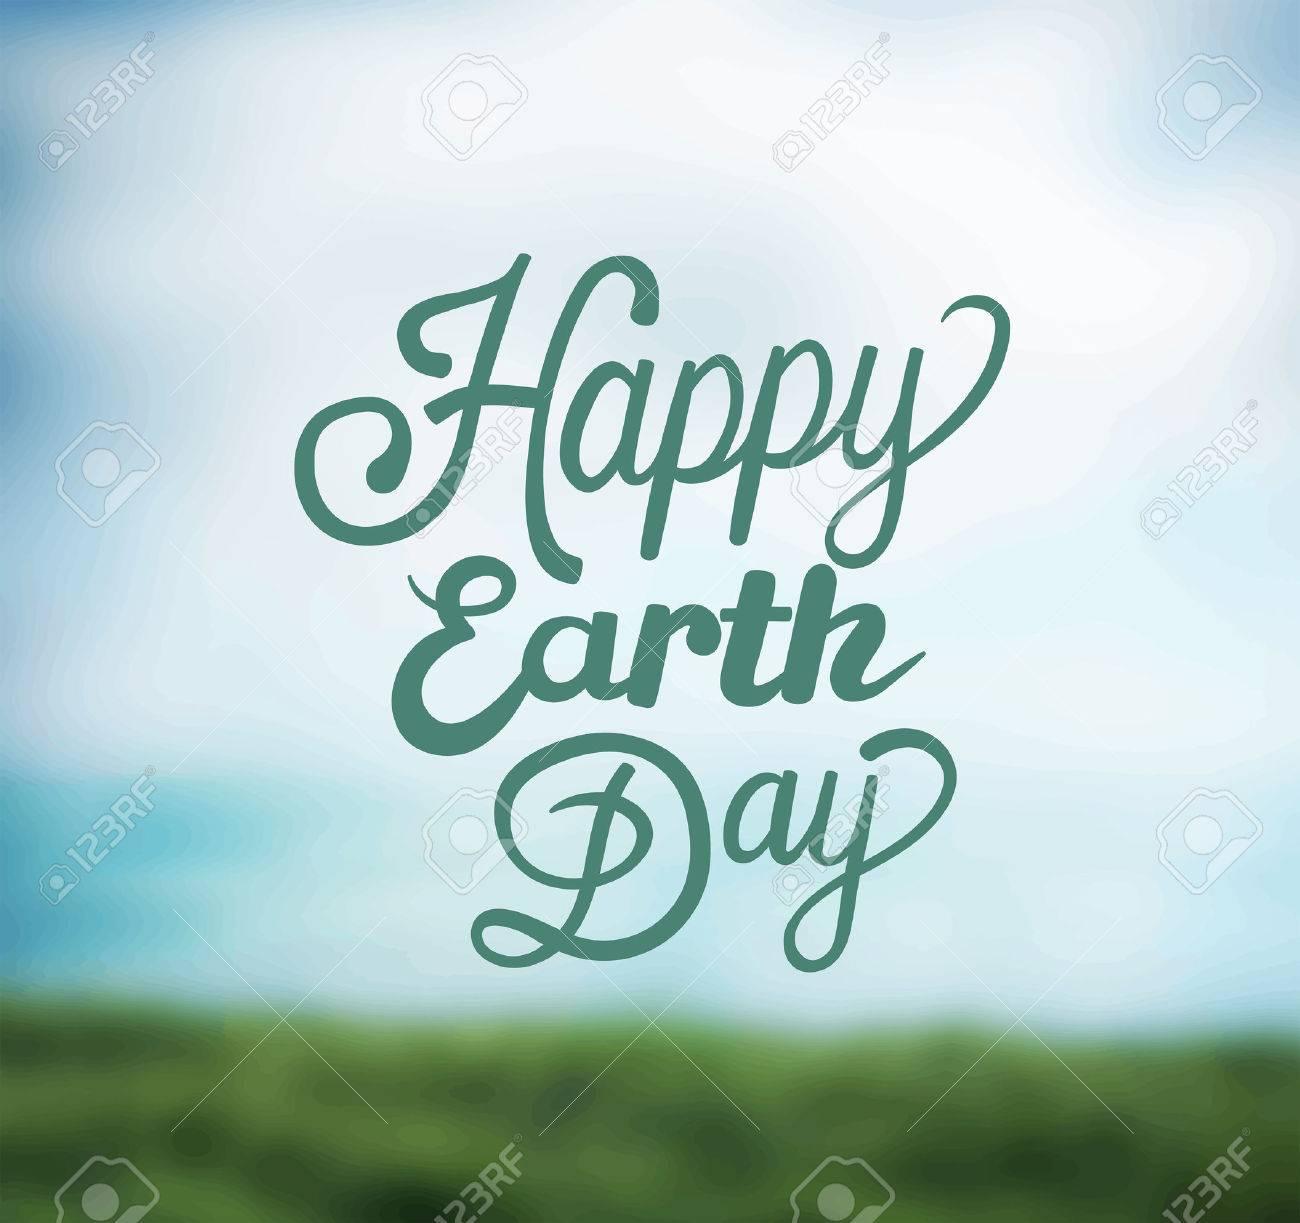 Digitally generated Earth day vector Stock Vector - 38677088